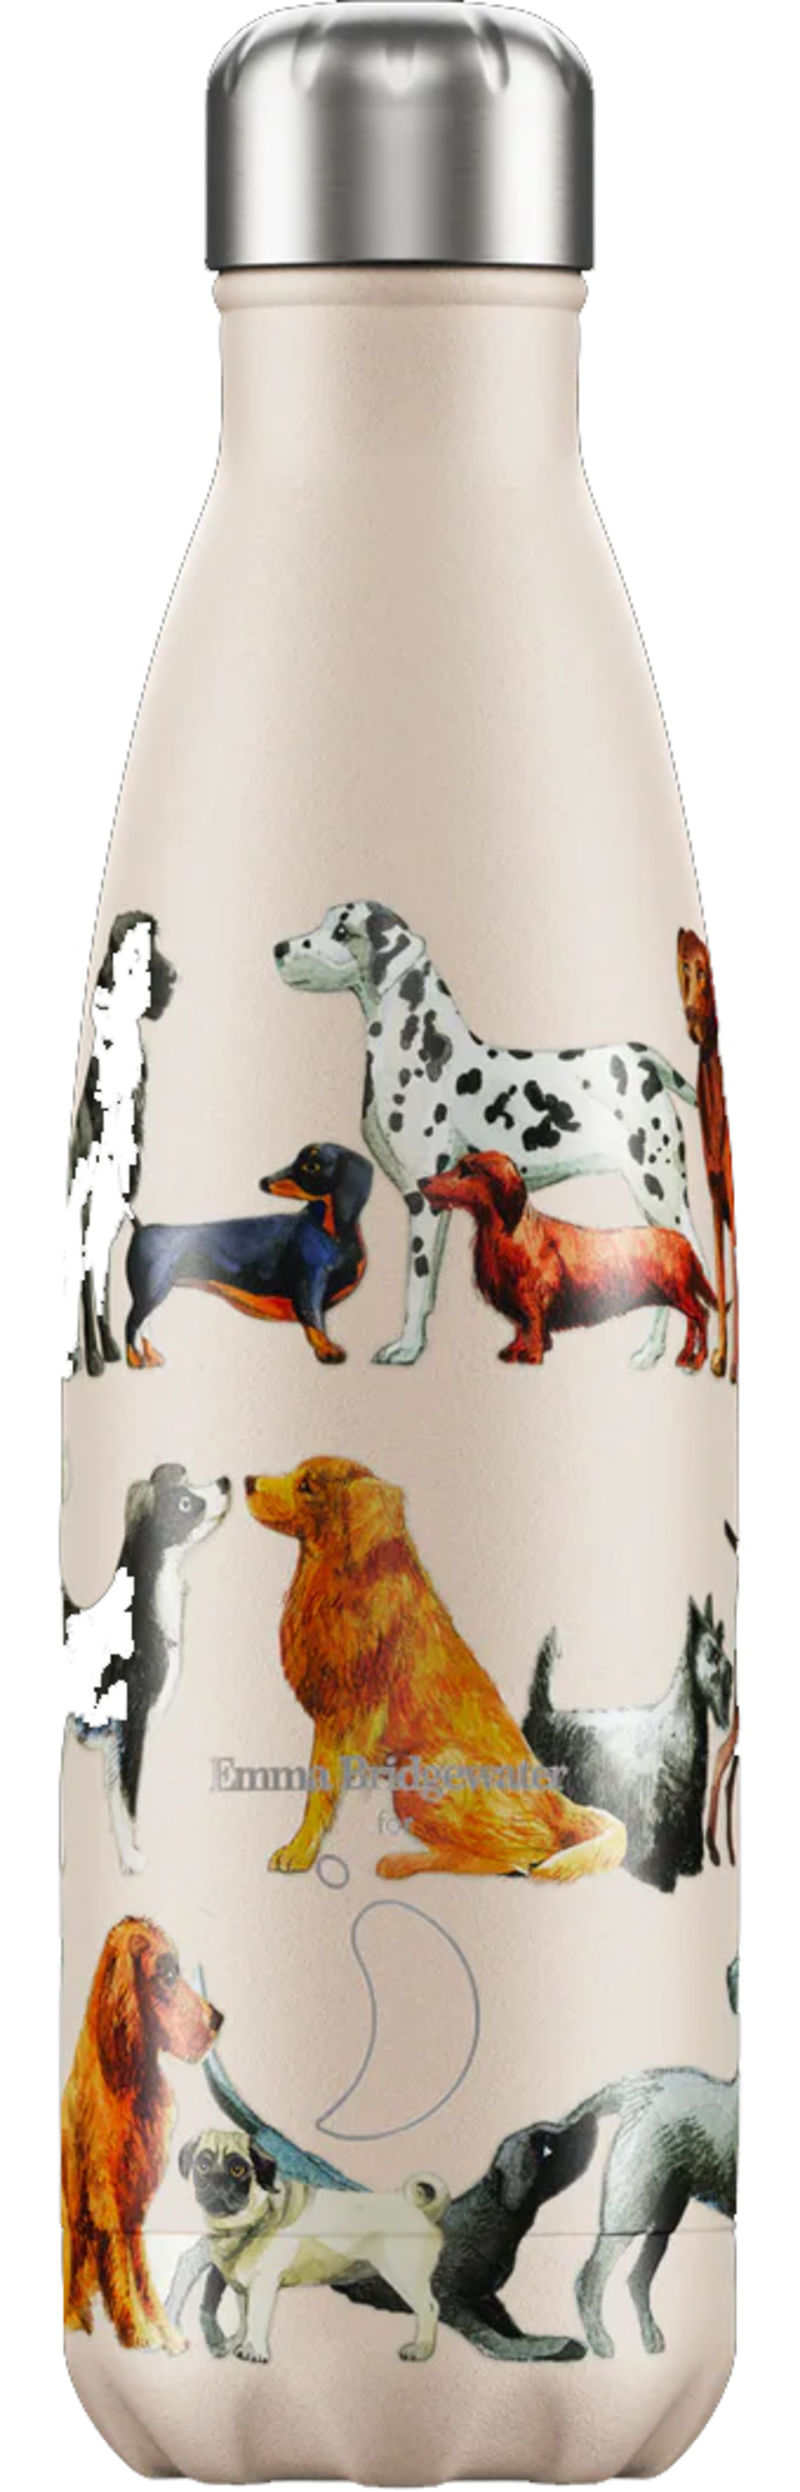 BOTELLA INOX DOGS 500ML